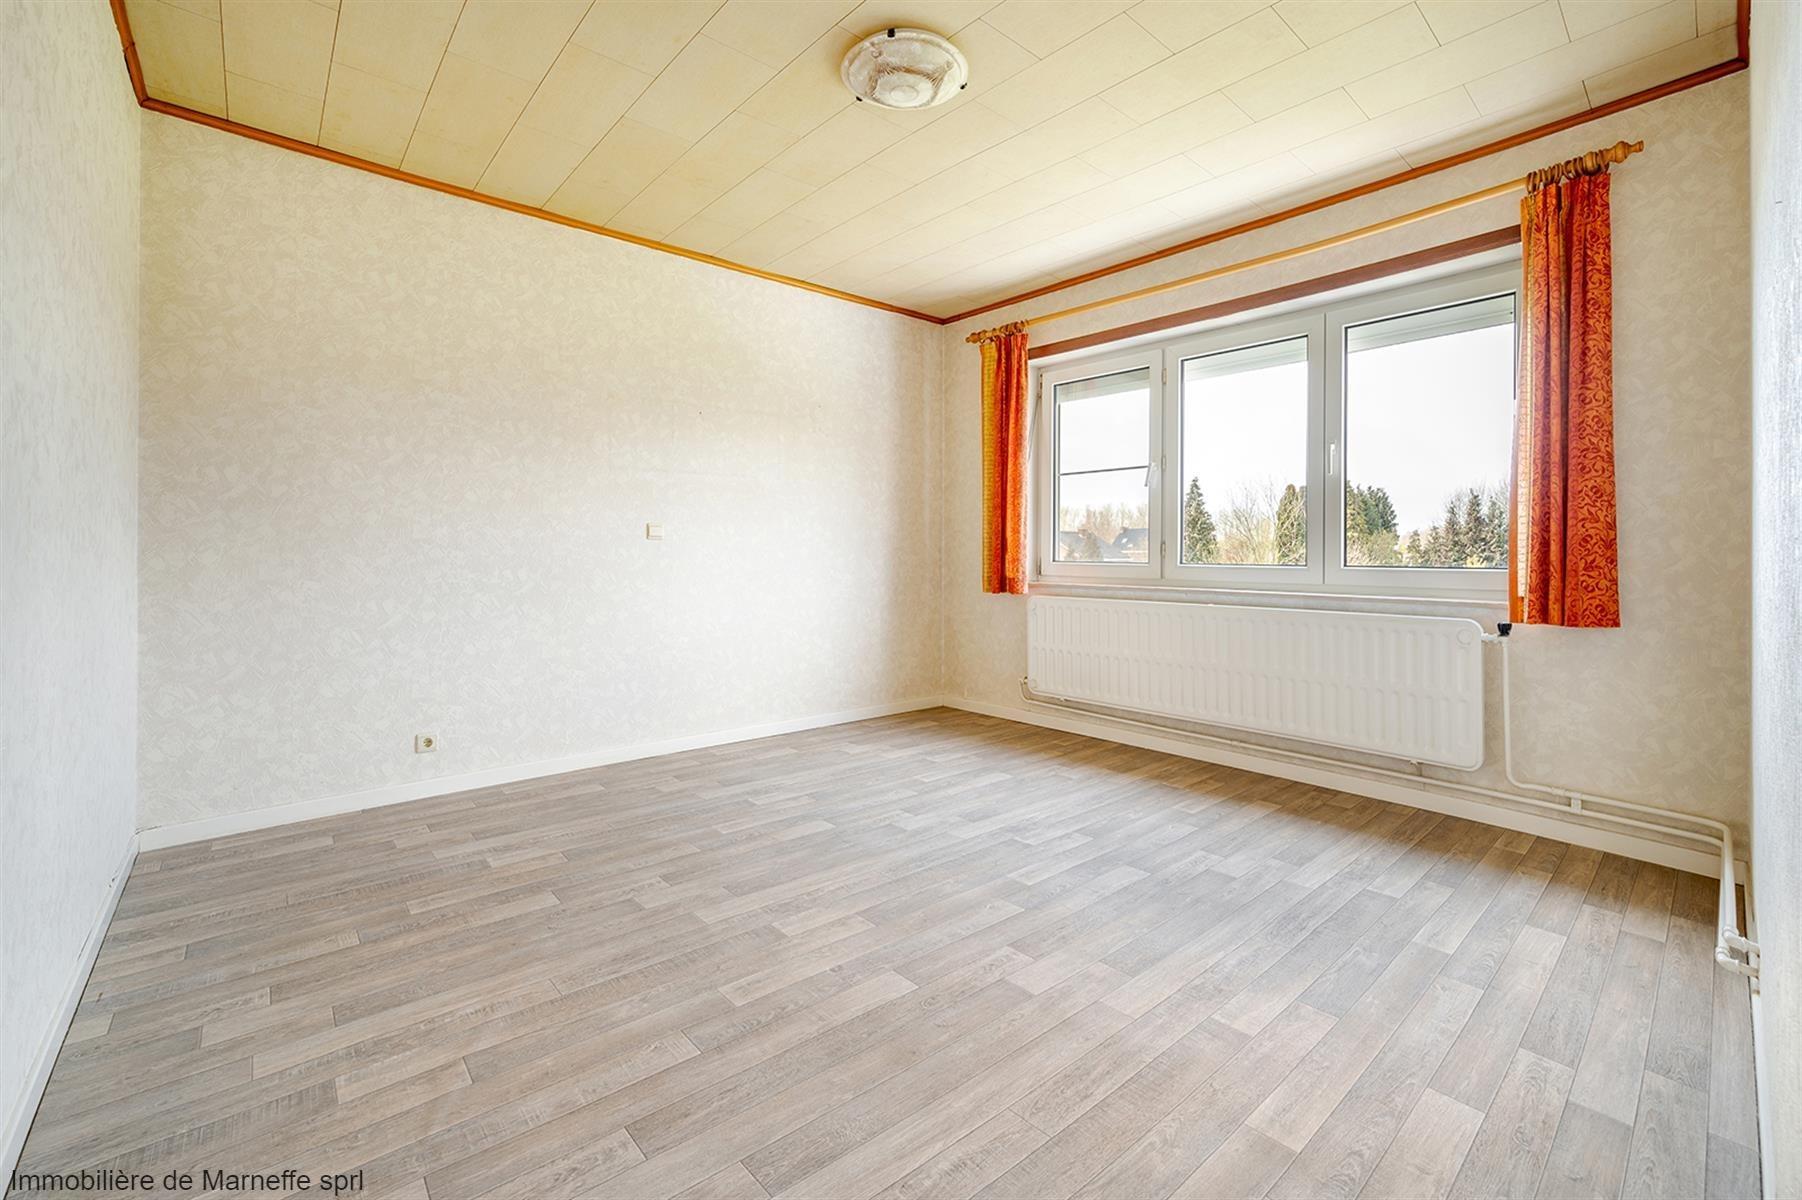 Maison - Berloz - #4343525-19